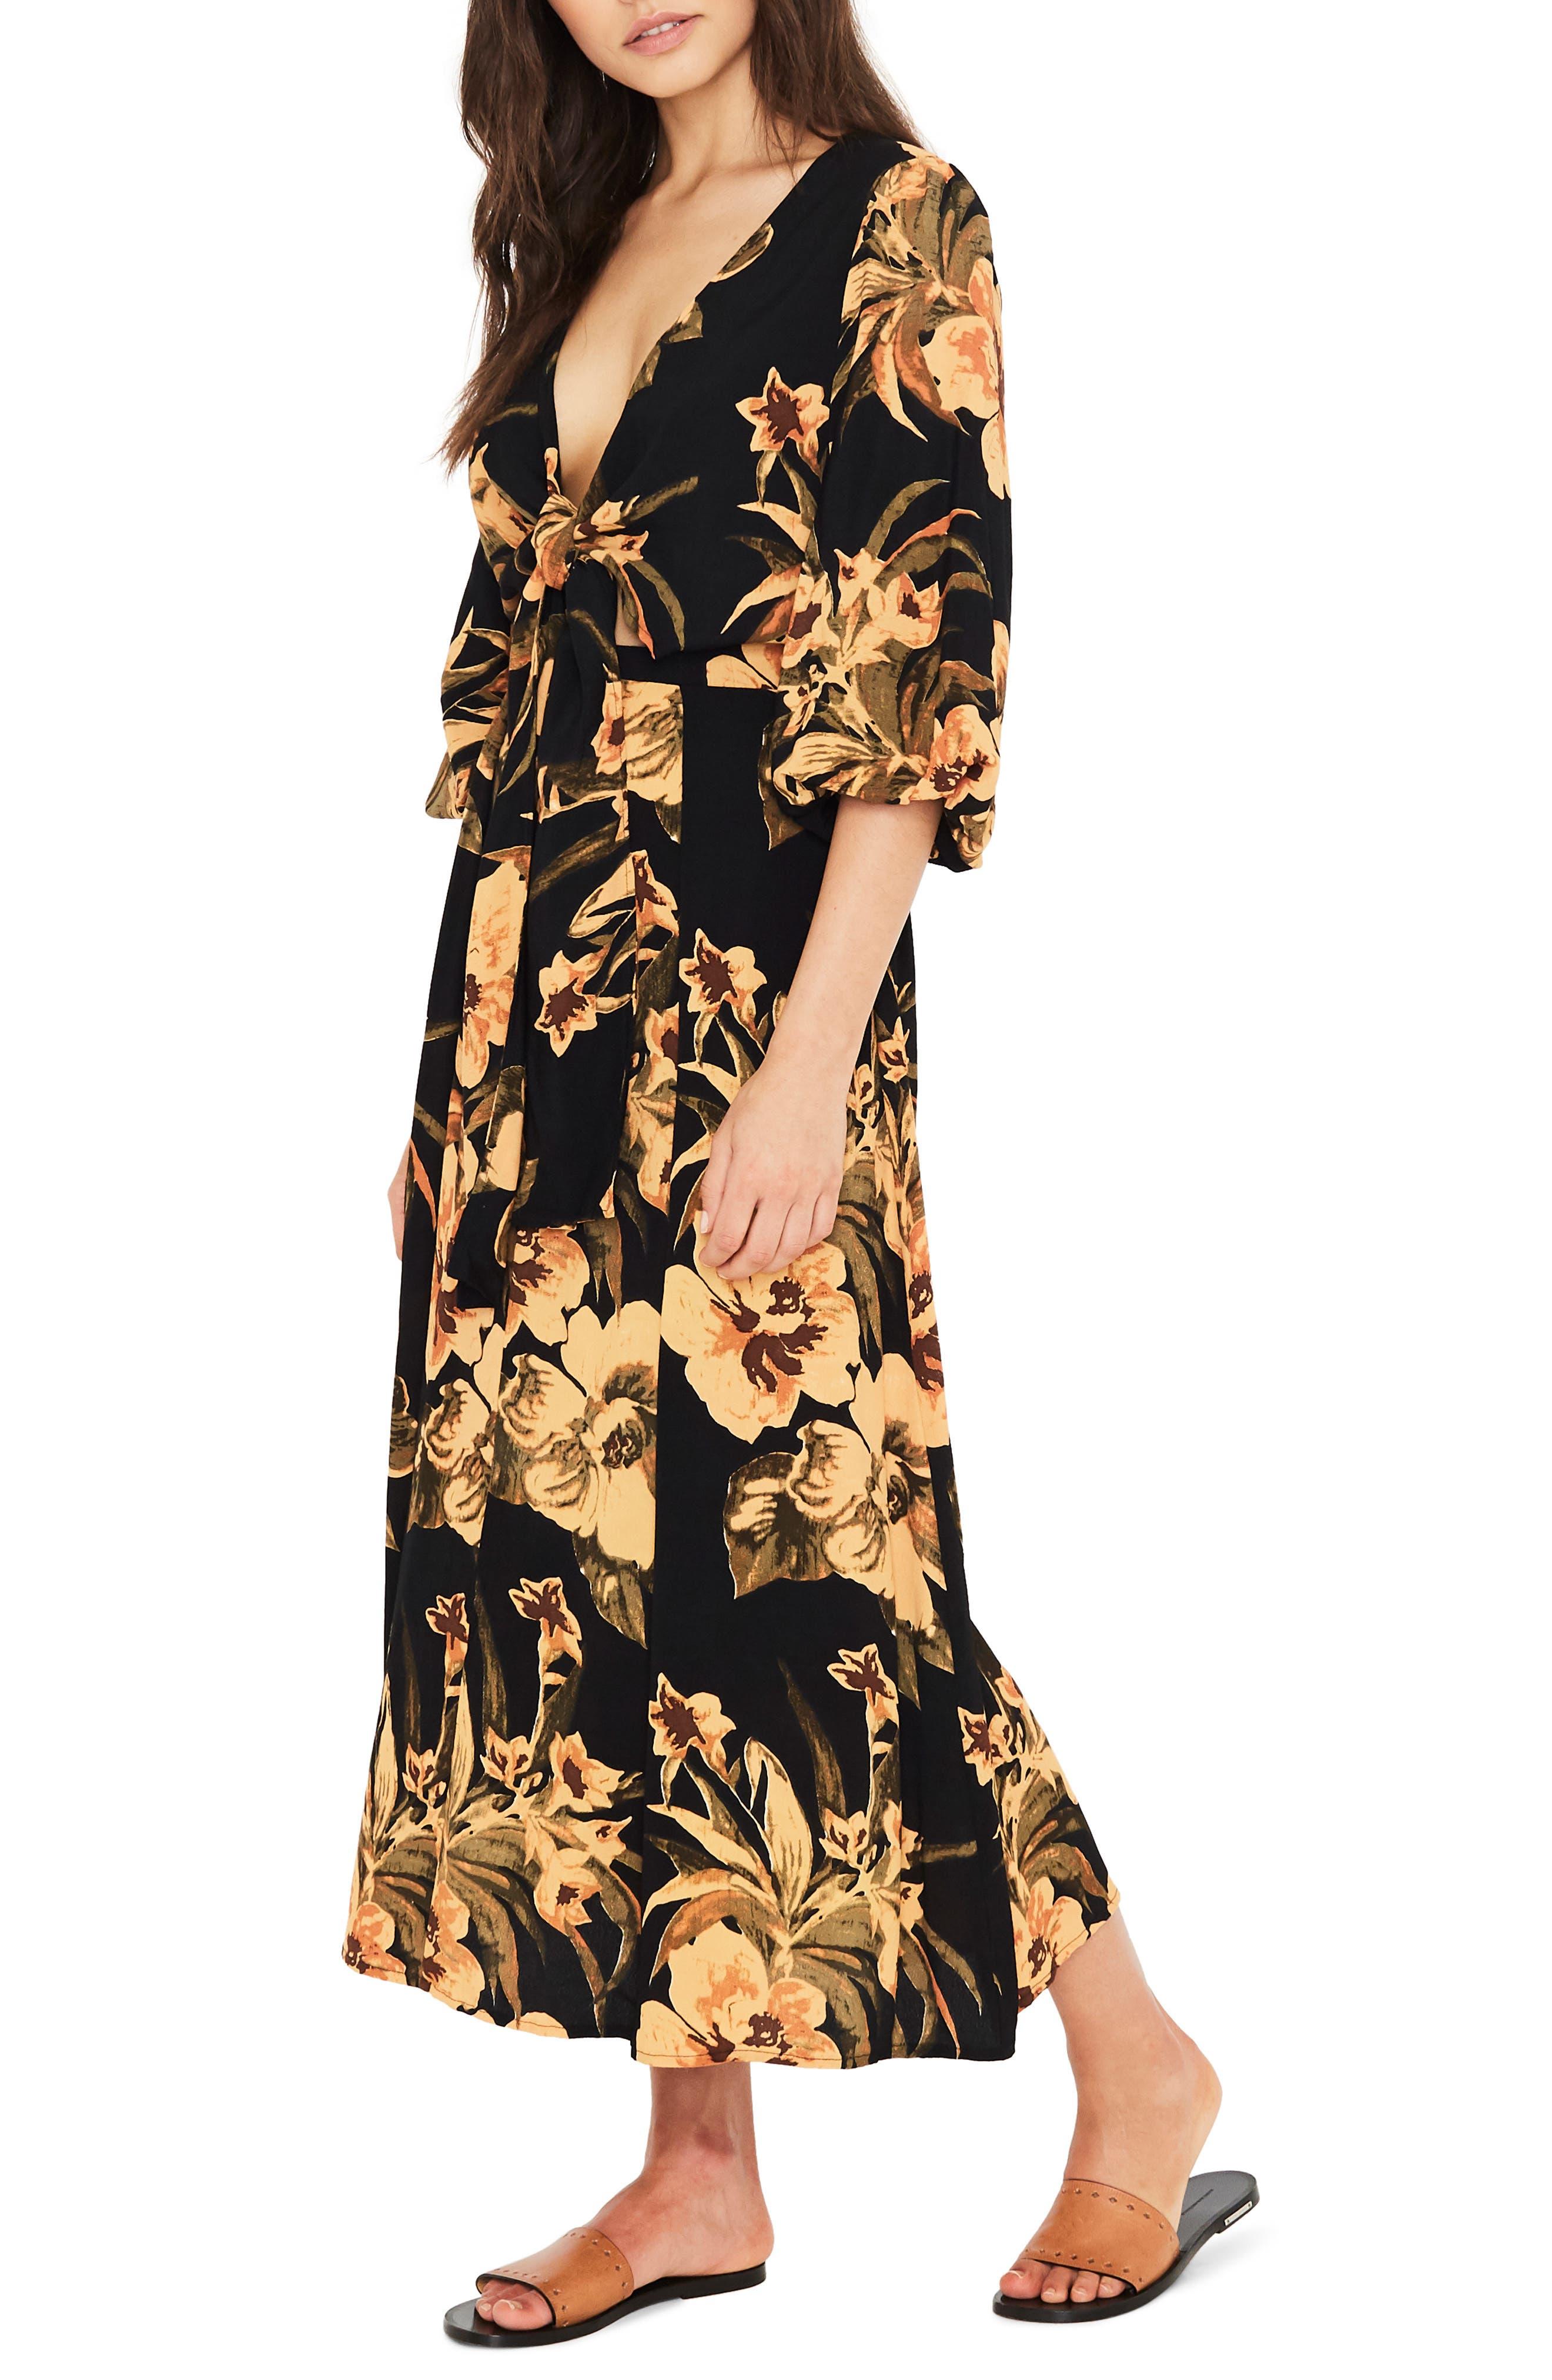 Oliviera Floral Print Cutout Midi Dress,                             Alternate thumbnail 3, color,                             CARIBBEAN PRINT